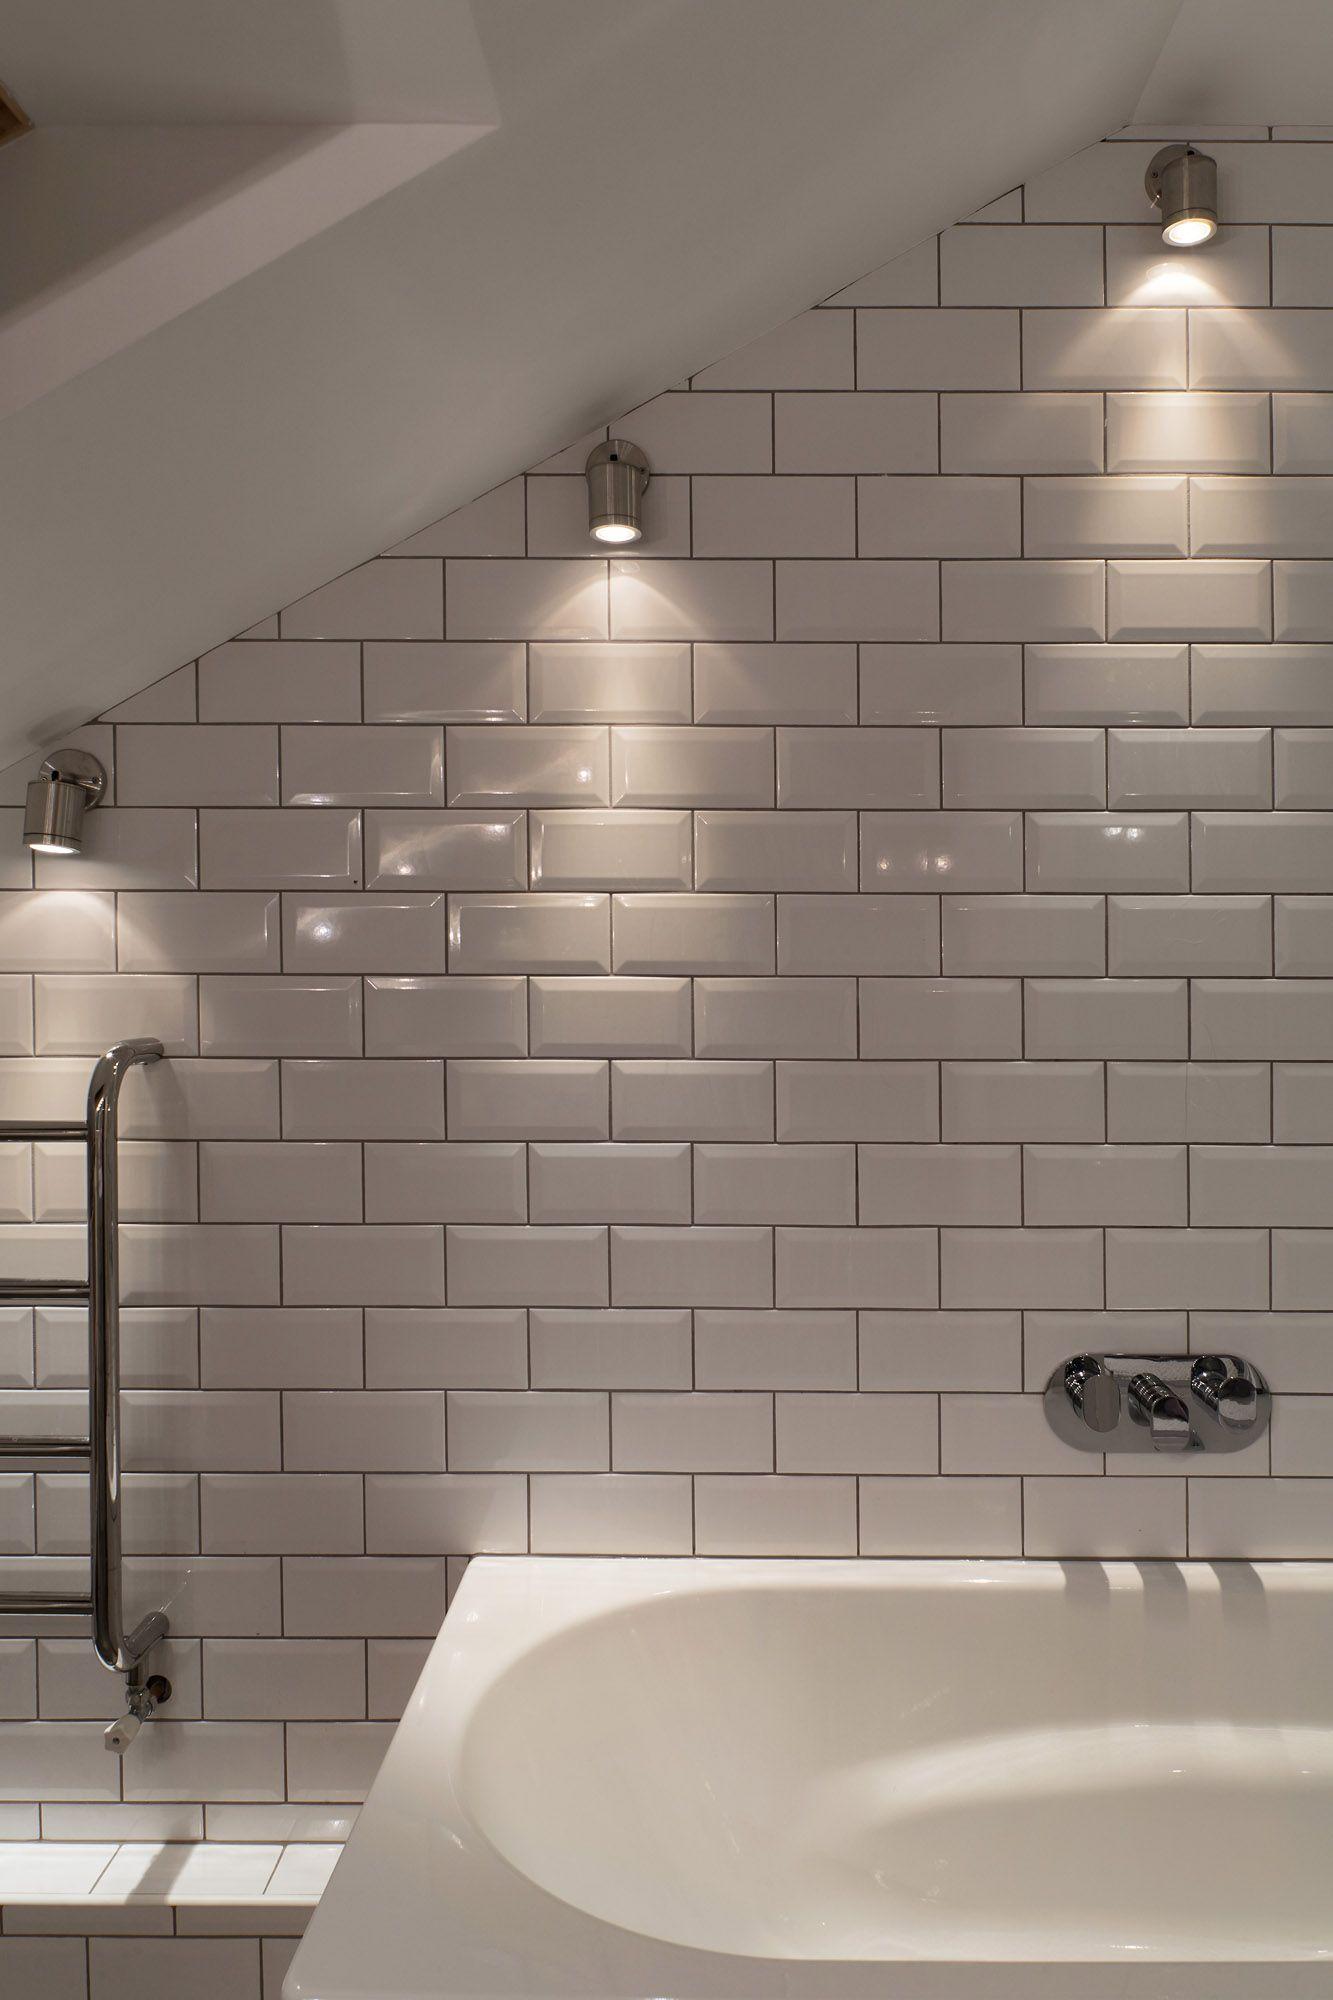 Directional Spots For Under Eaves Over Shower Sloped Ceiling